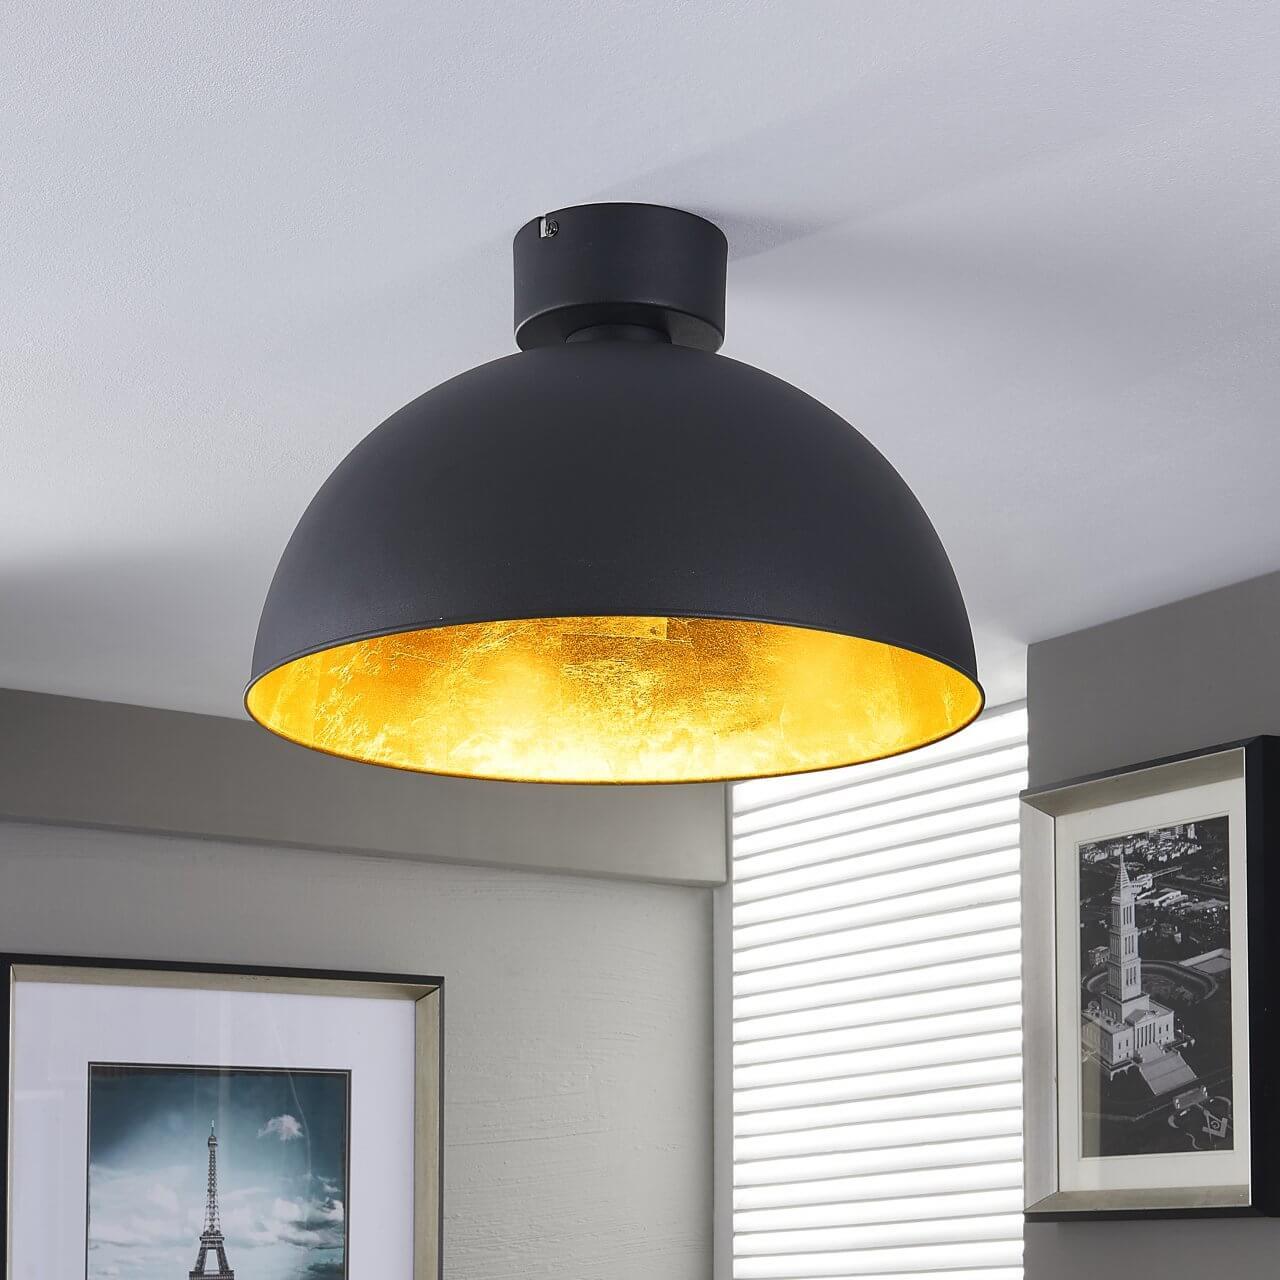 Strakke metalen plafondlamp